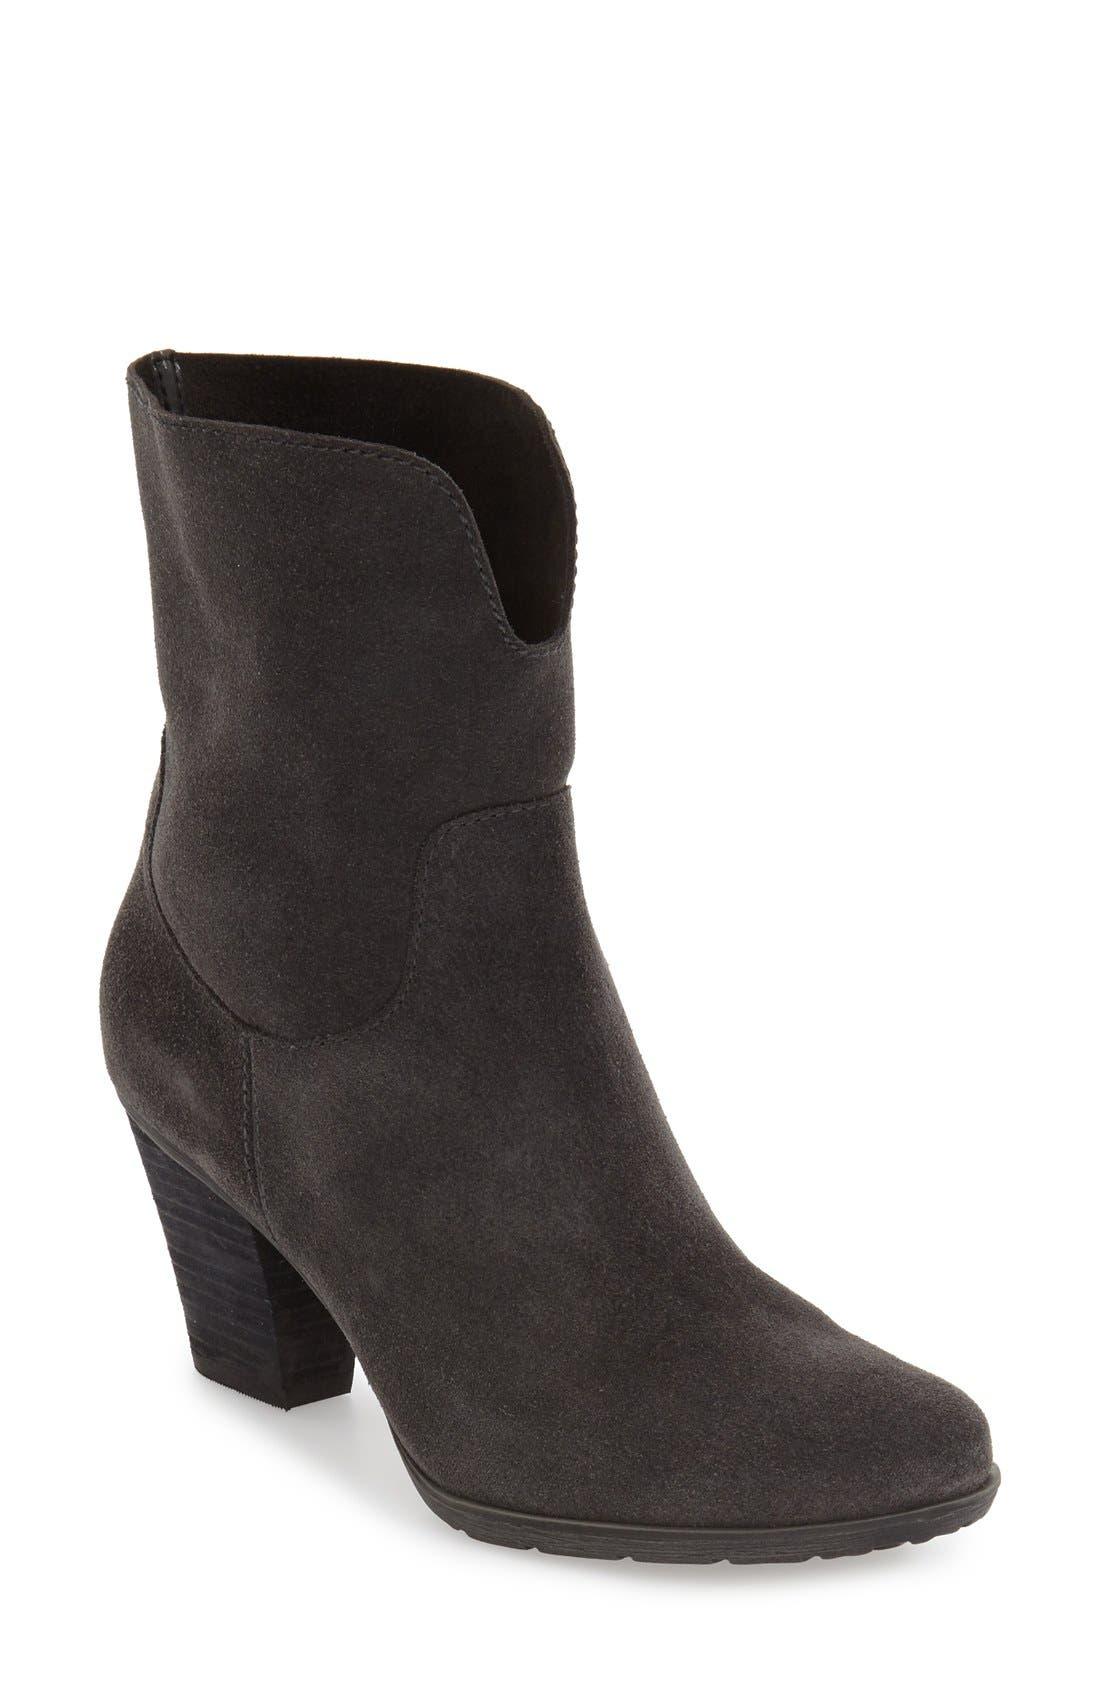 Main Image - Blondo Fay Waterproof Ankle Boot (Women)